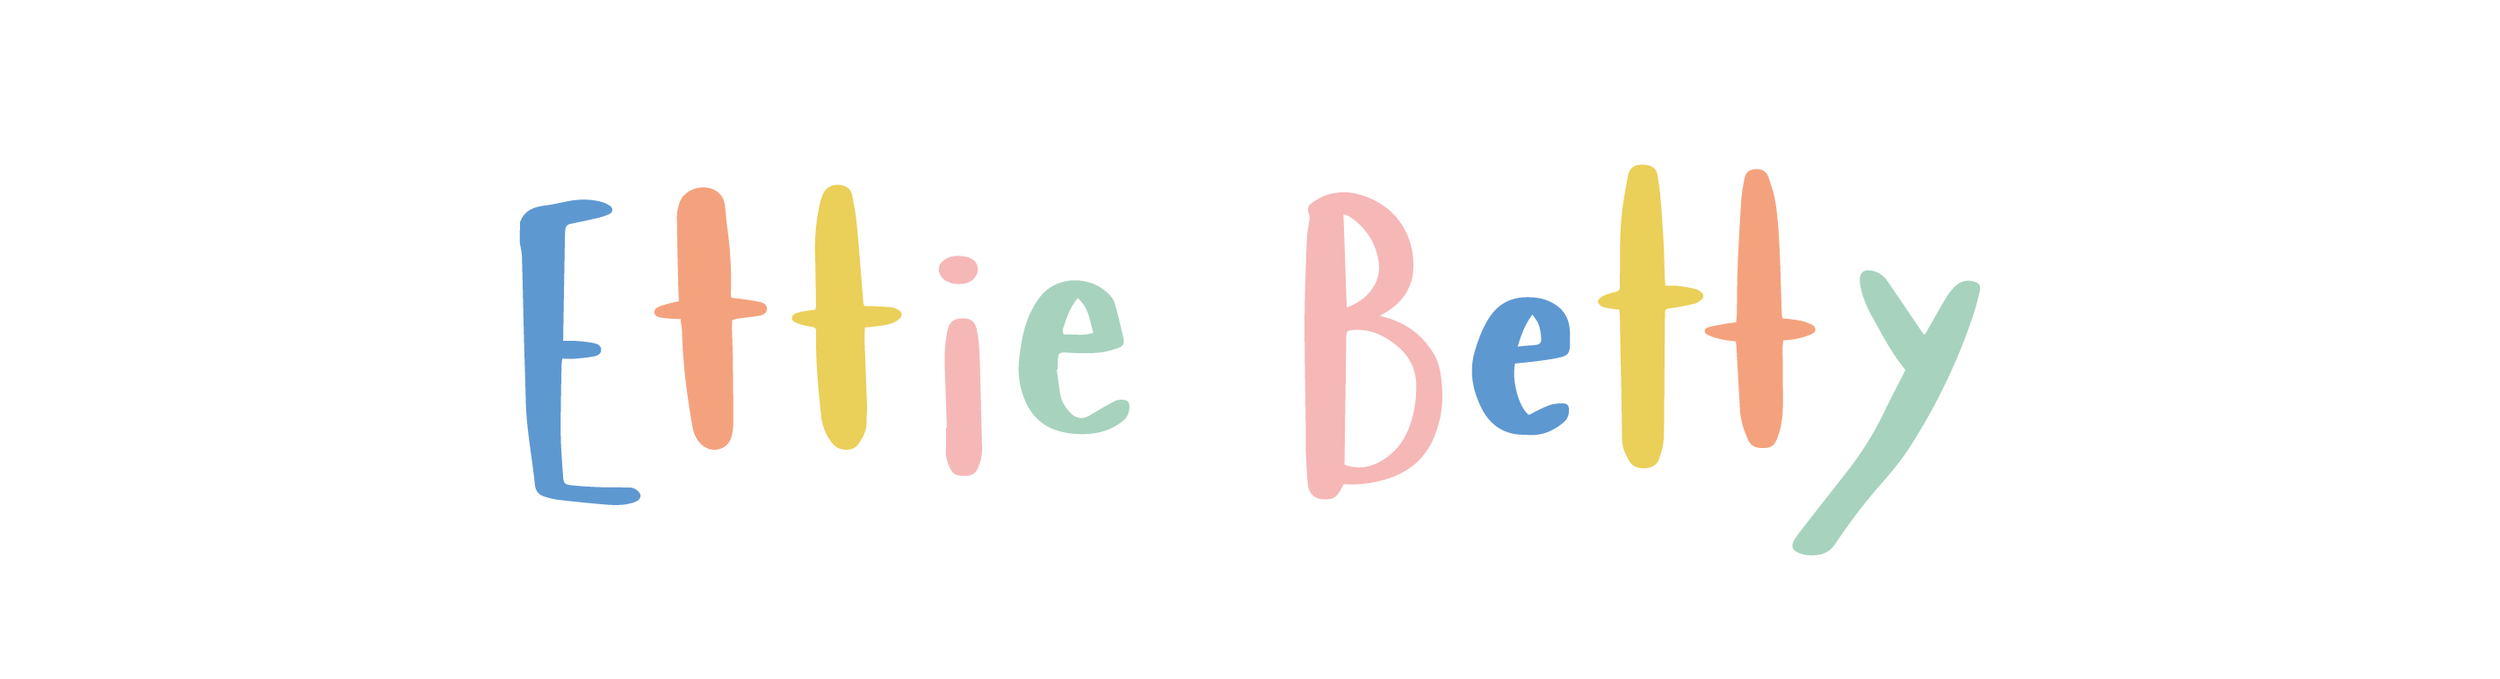 Lisa Claire Stewart Design Ettie Betty Web Banner Logo-01.png